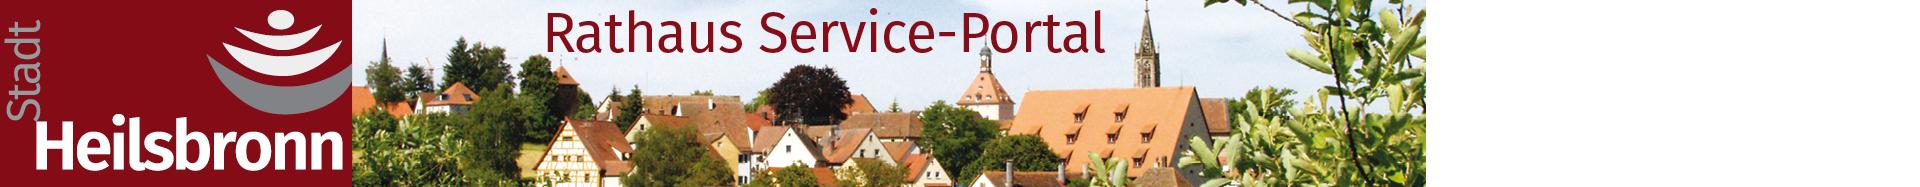 Rathaus Service-Portal Heilsbronn